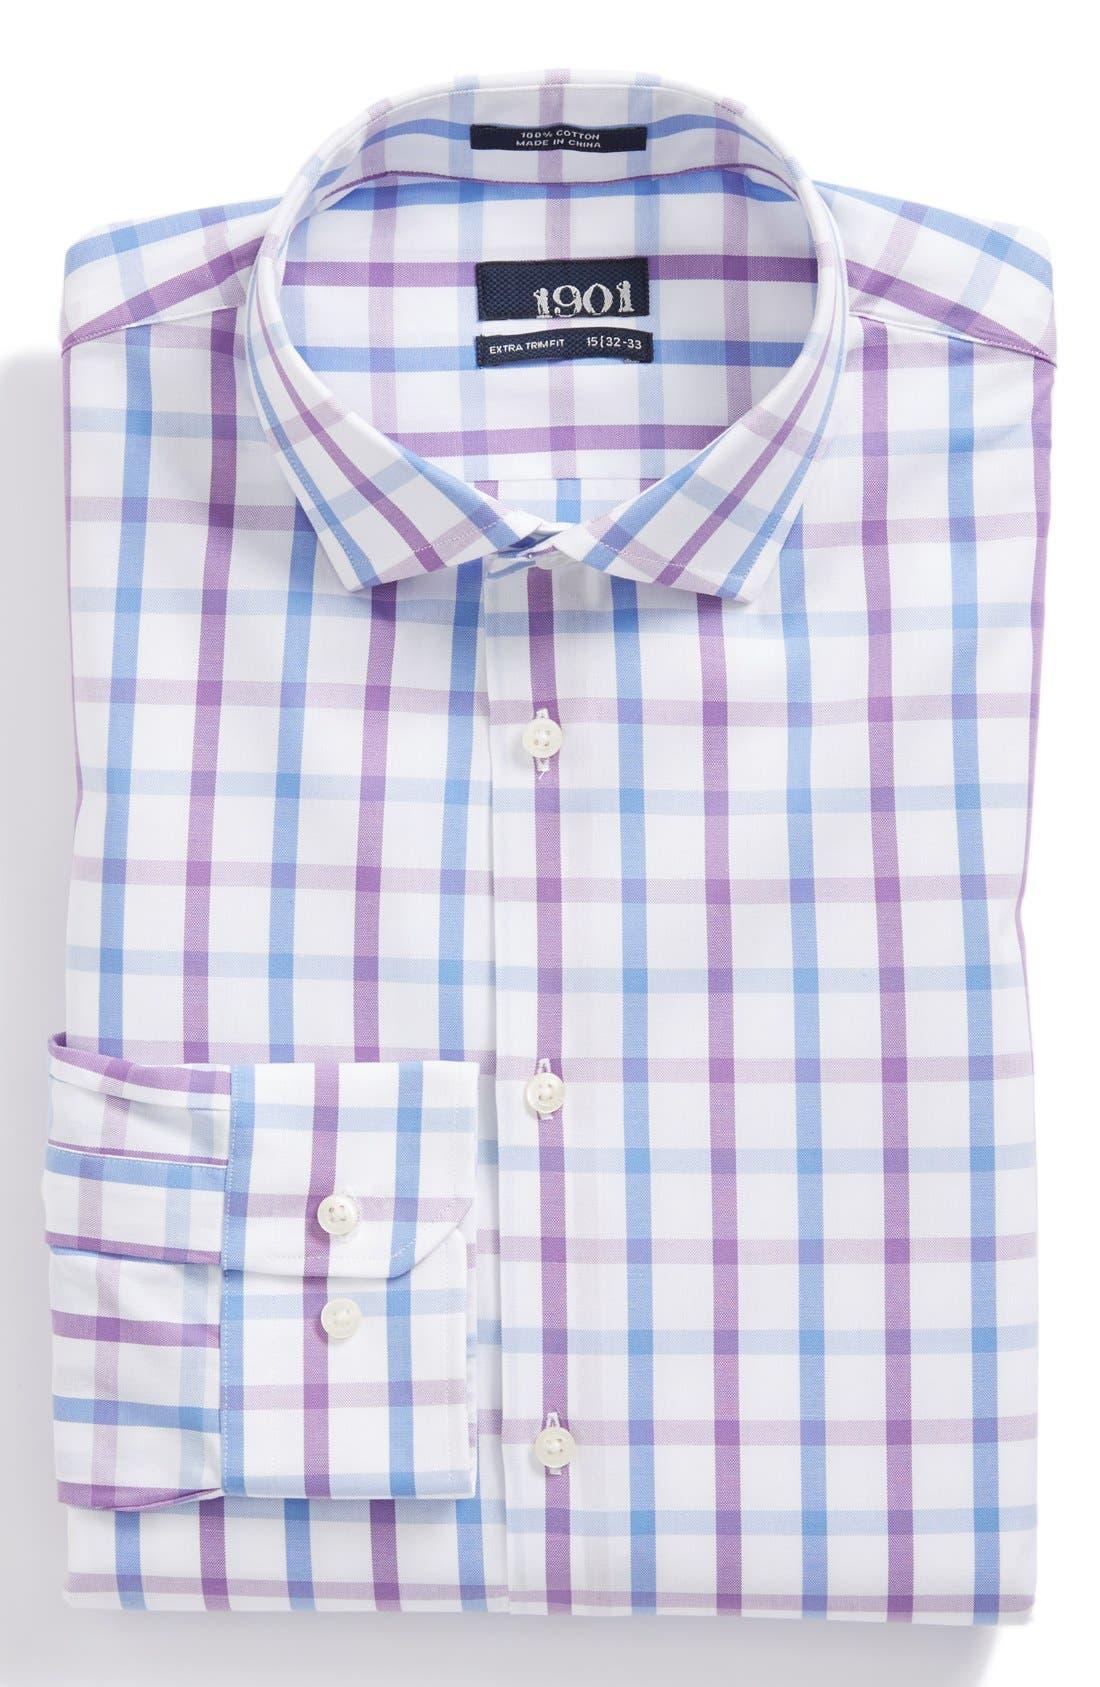 Alternate Image 1 Selected - 1901 Extra Trim Fit Dress Shirt